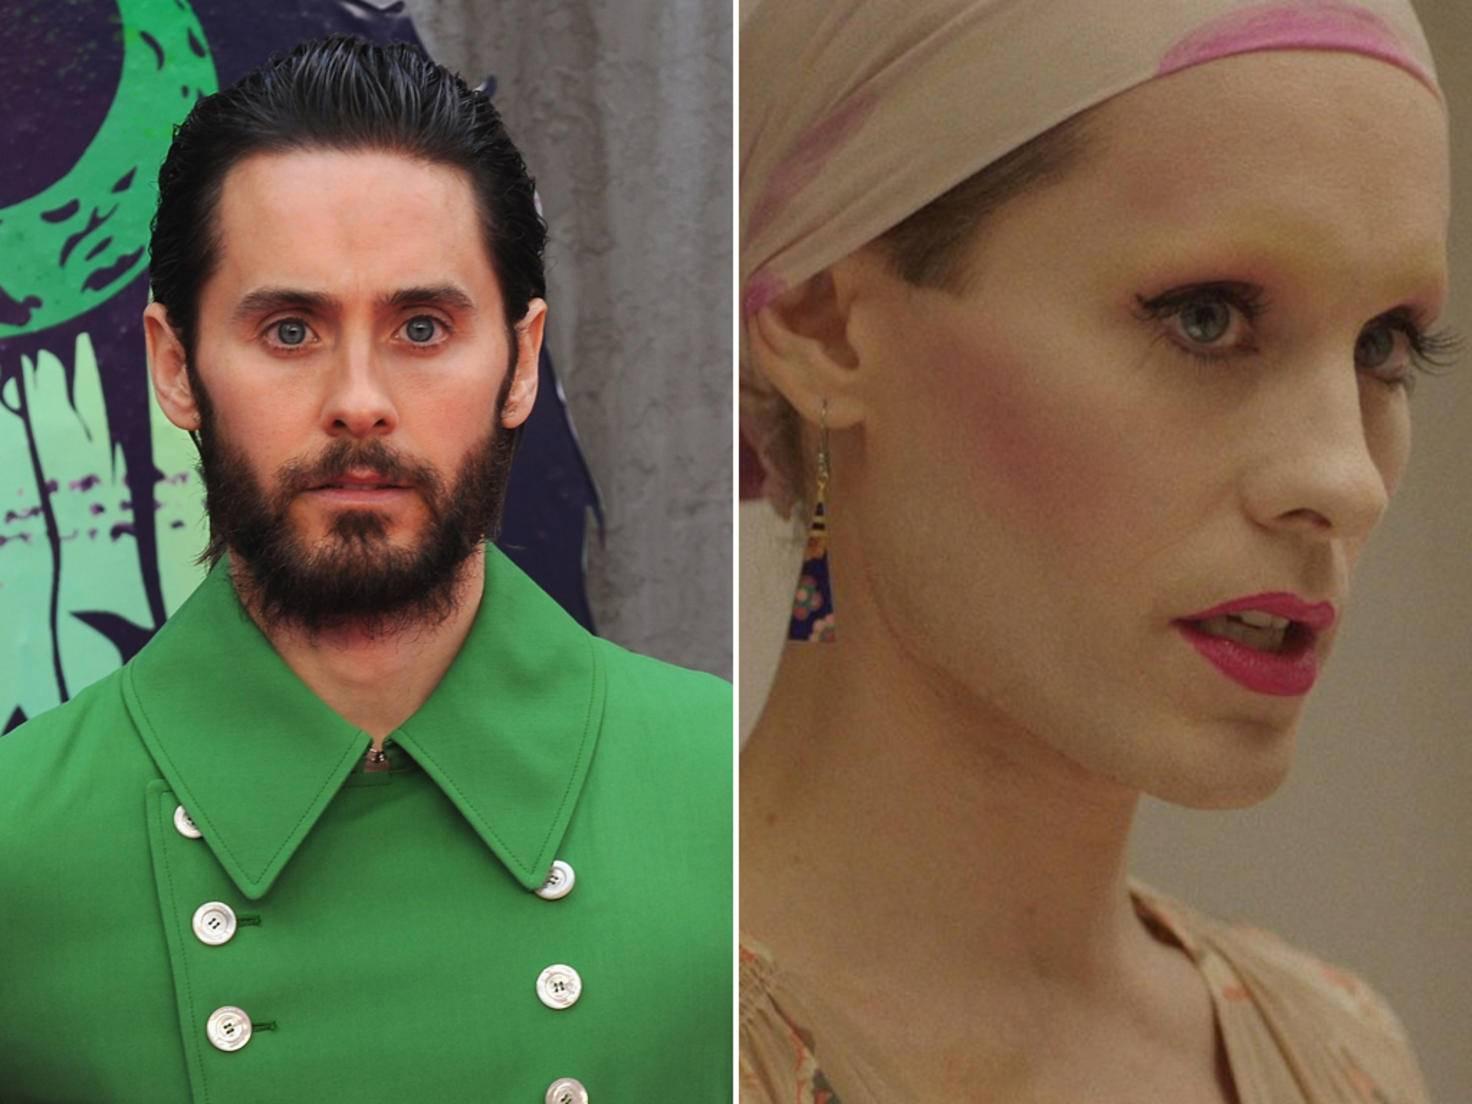 Jared Leto kann sich auch als Frau sehen lassen.